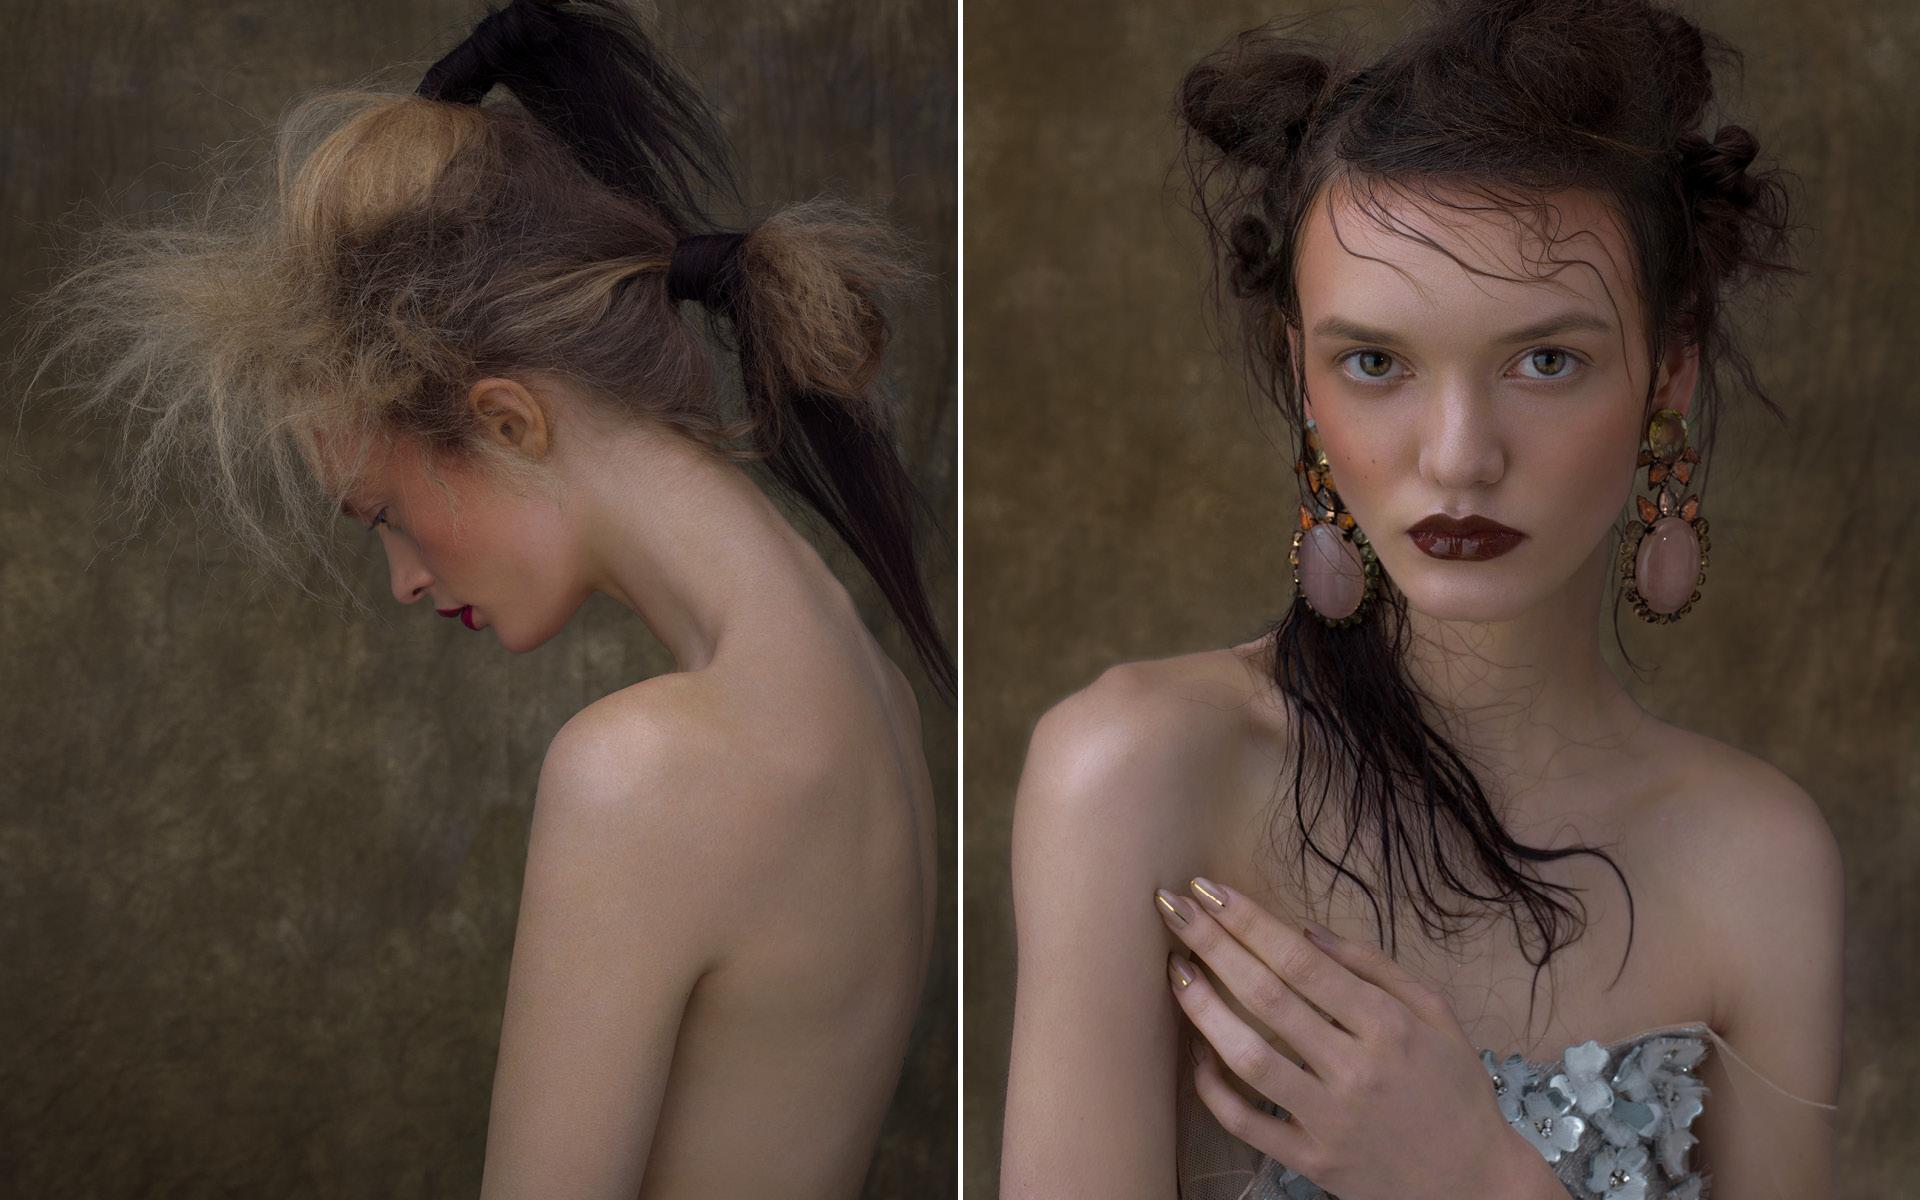 Spirit-&-Flesh-Magazine_By_Gian-Andrea-di-Stefano_4